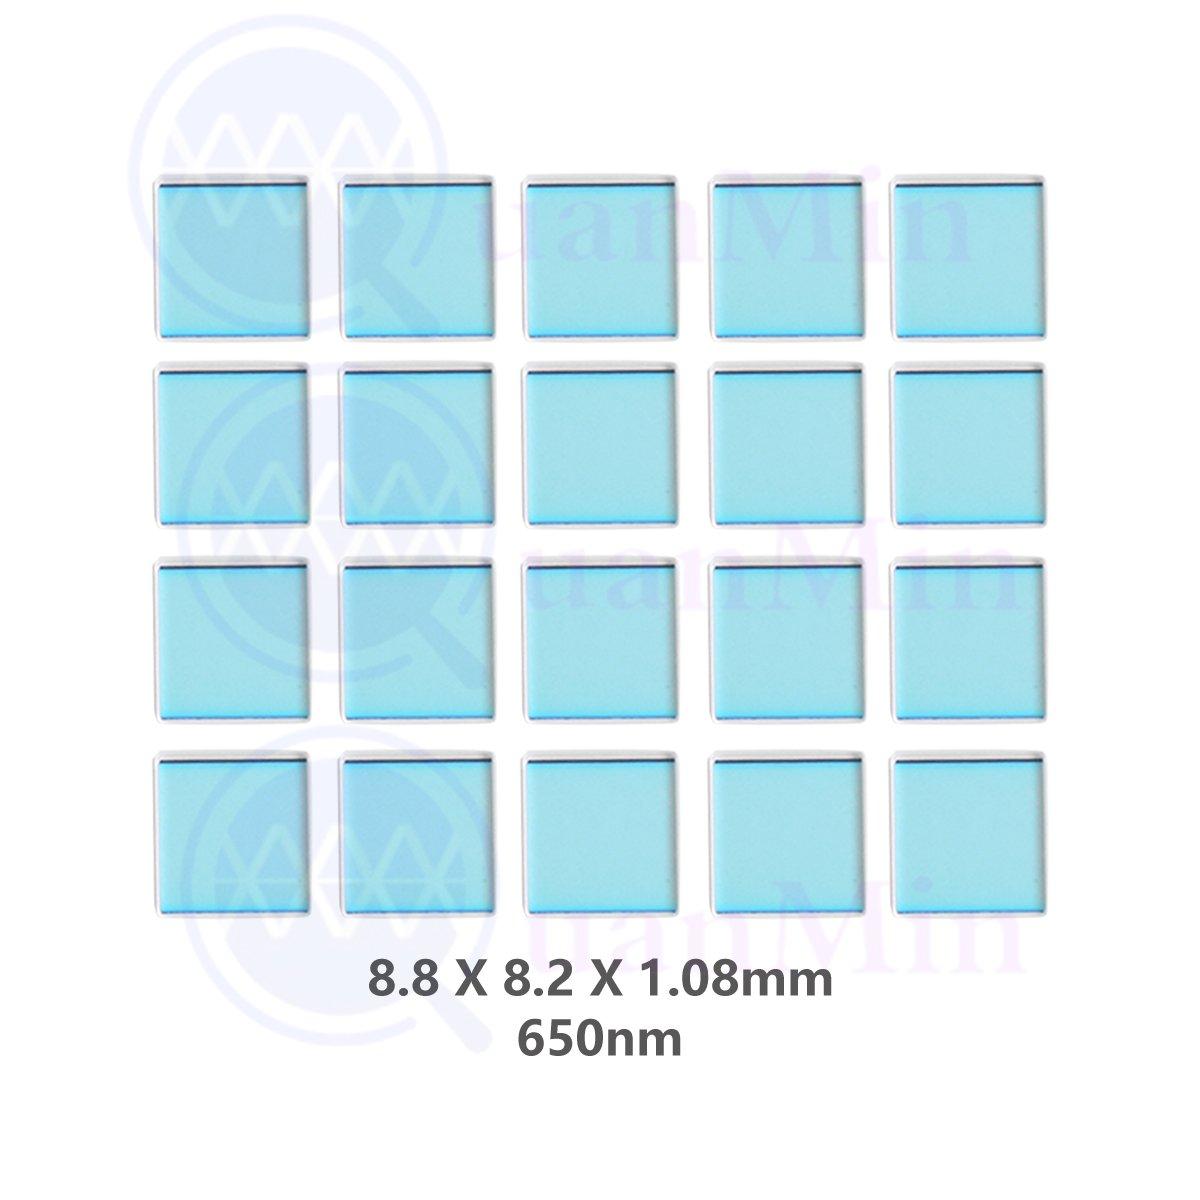 Quanmin 20pcs/1 Lot 8.8mm×8.2mm×1.08mm 650nm IR-Cut Blocking Filter Square Optical Low-Pass Infrared Block Filters For Camera Lens